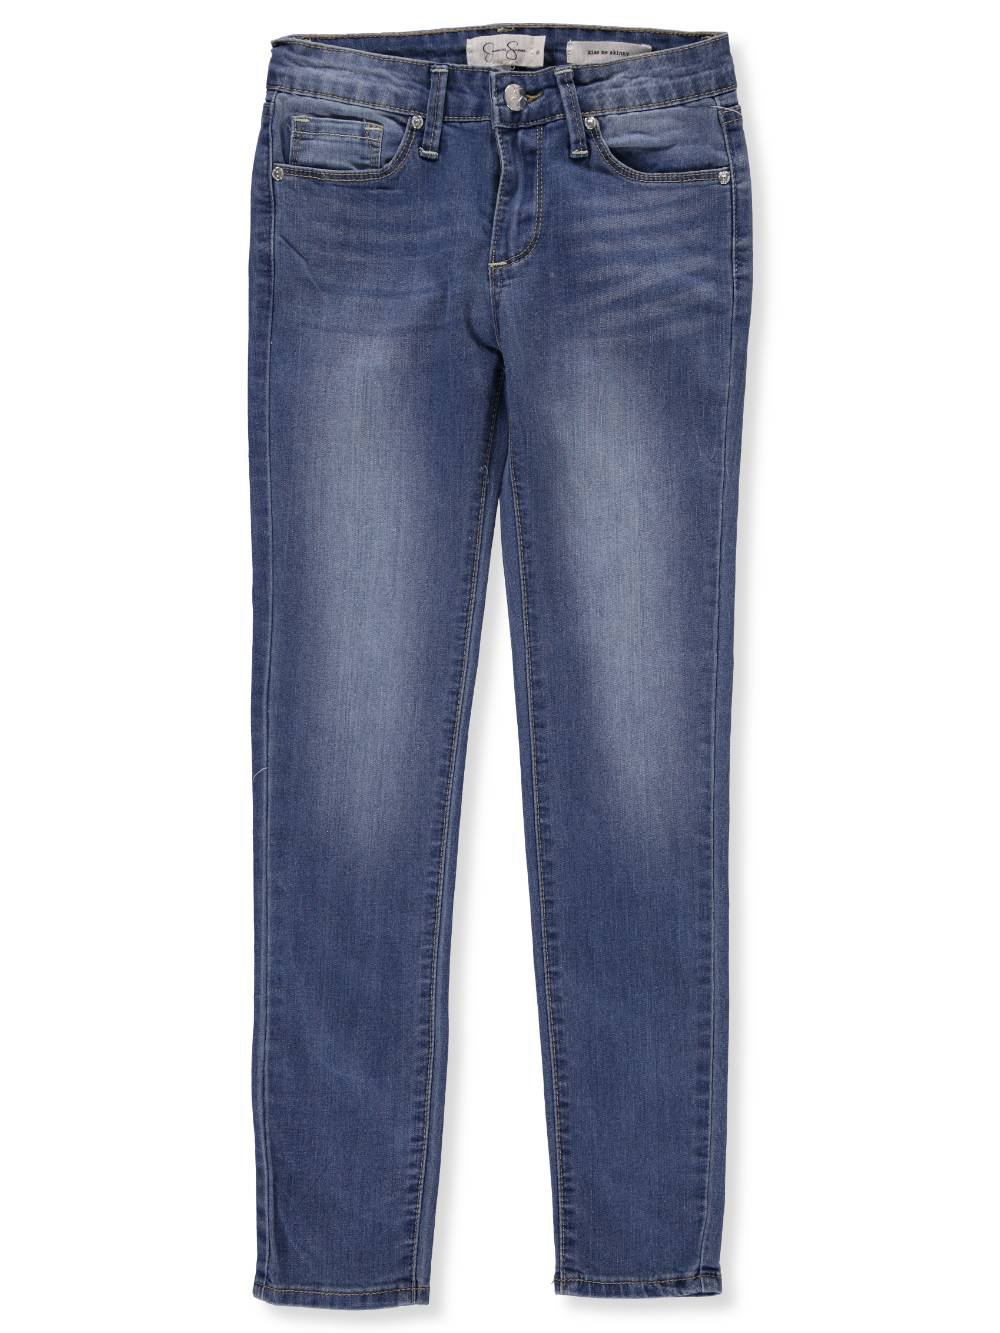 Jessica Simpson Girls' Skinny Jeans